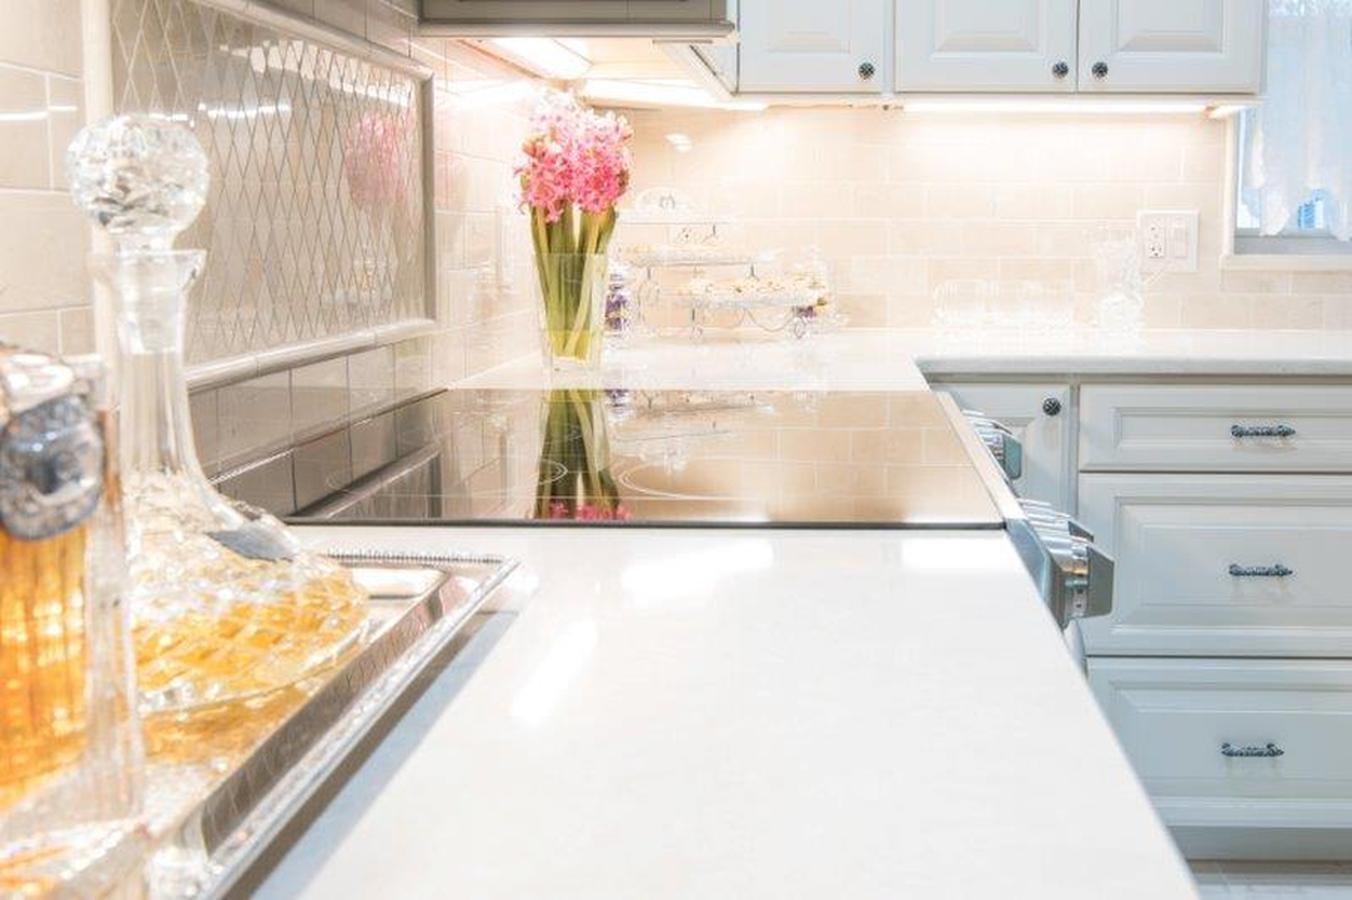 Kitchencraft Kclxcafe4cp Petite Cafeti/ère M/étallique